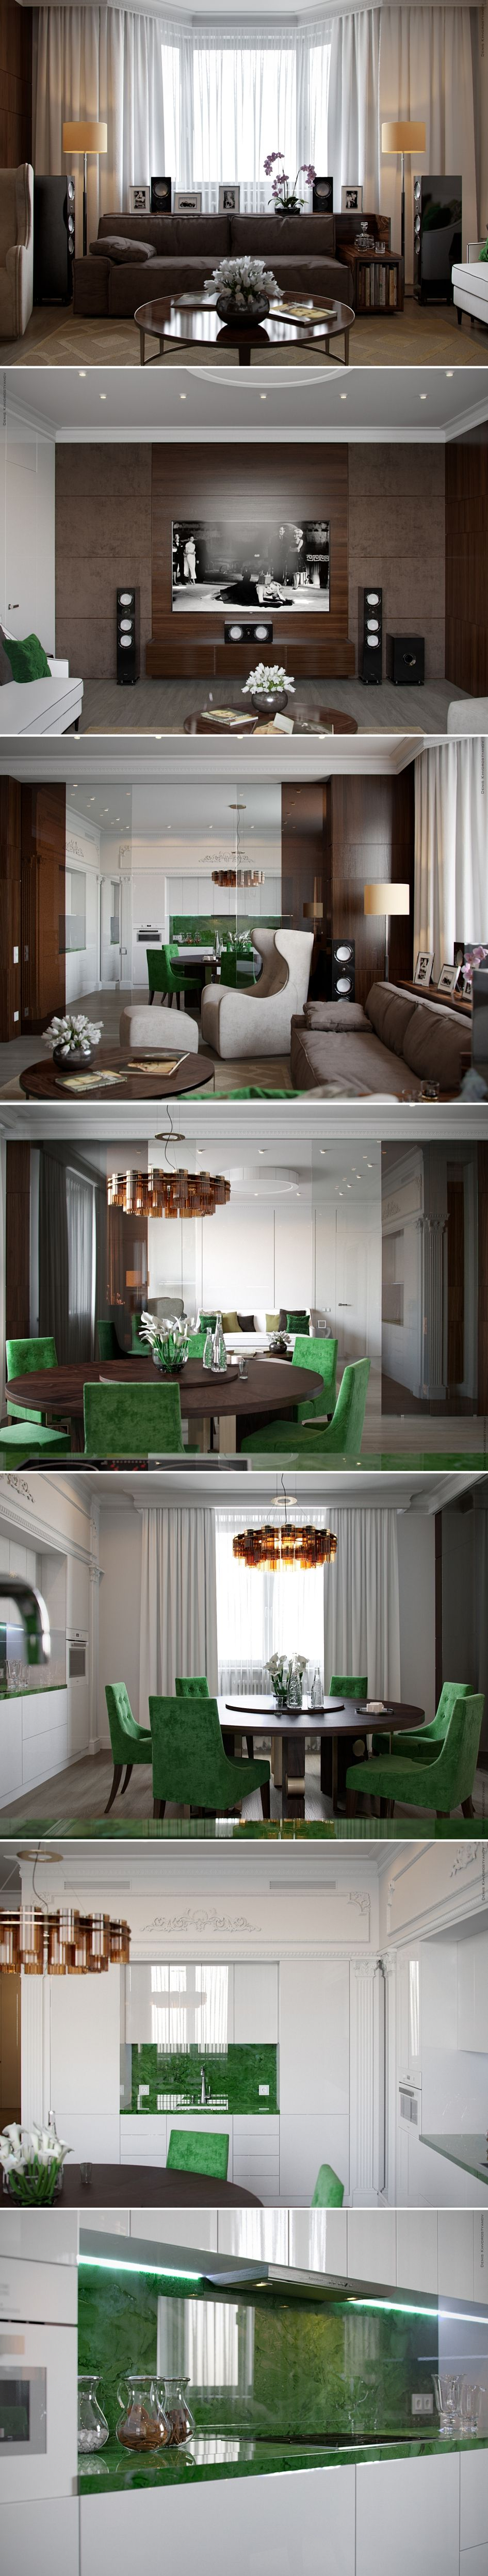 Кухня/гостиная - Галерея 3ddd.ru   Дизайн дома, Гостиная ...